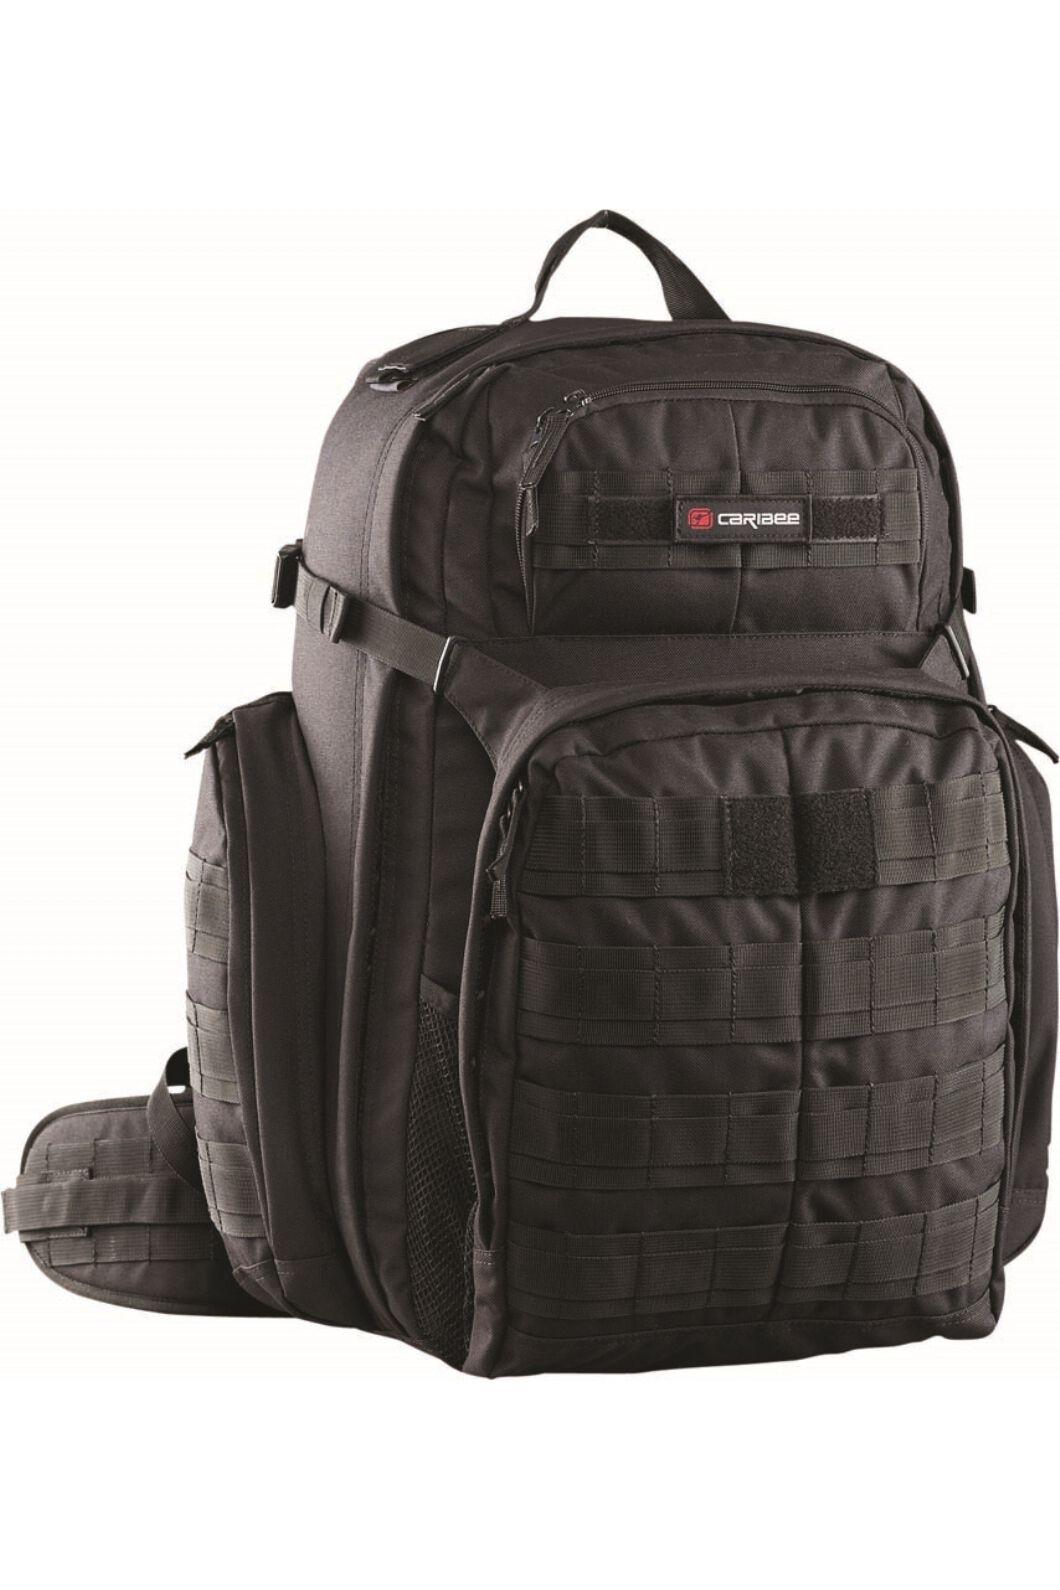 Caribee OPS Auscam Daypack, Black, hi-res